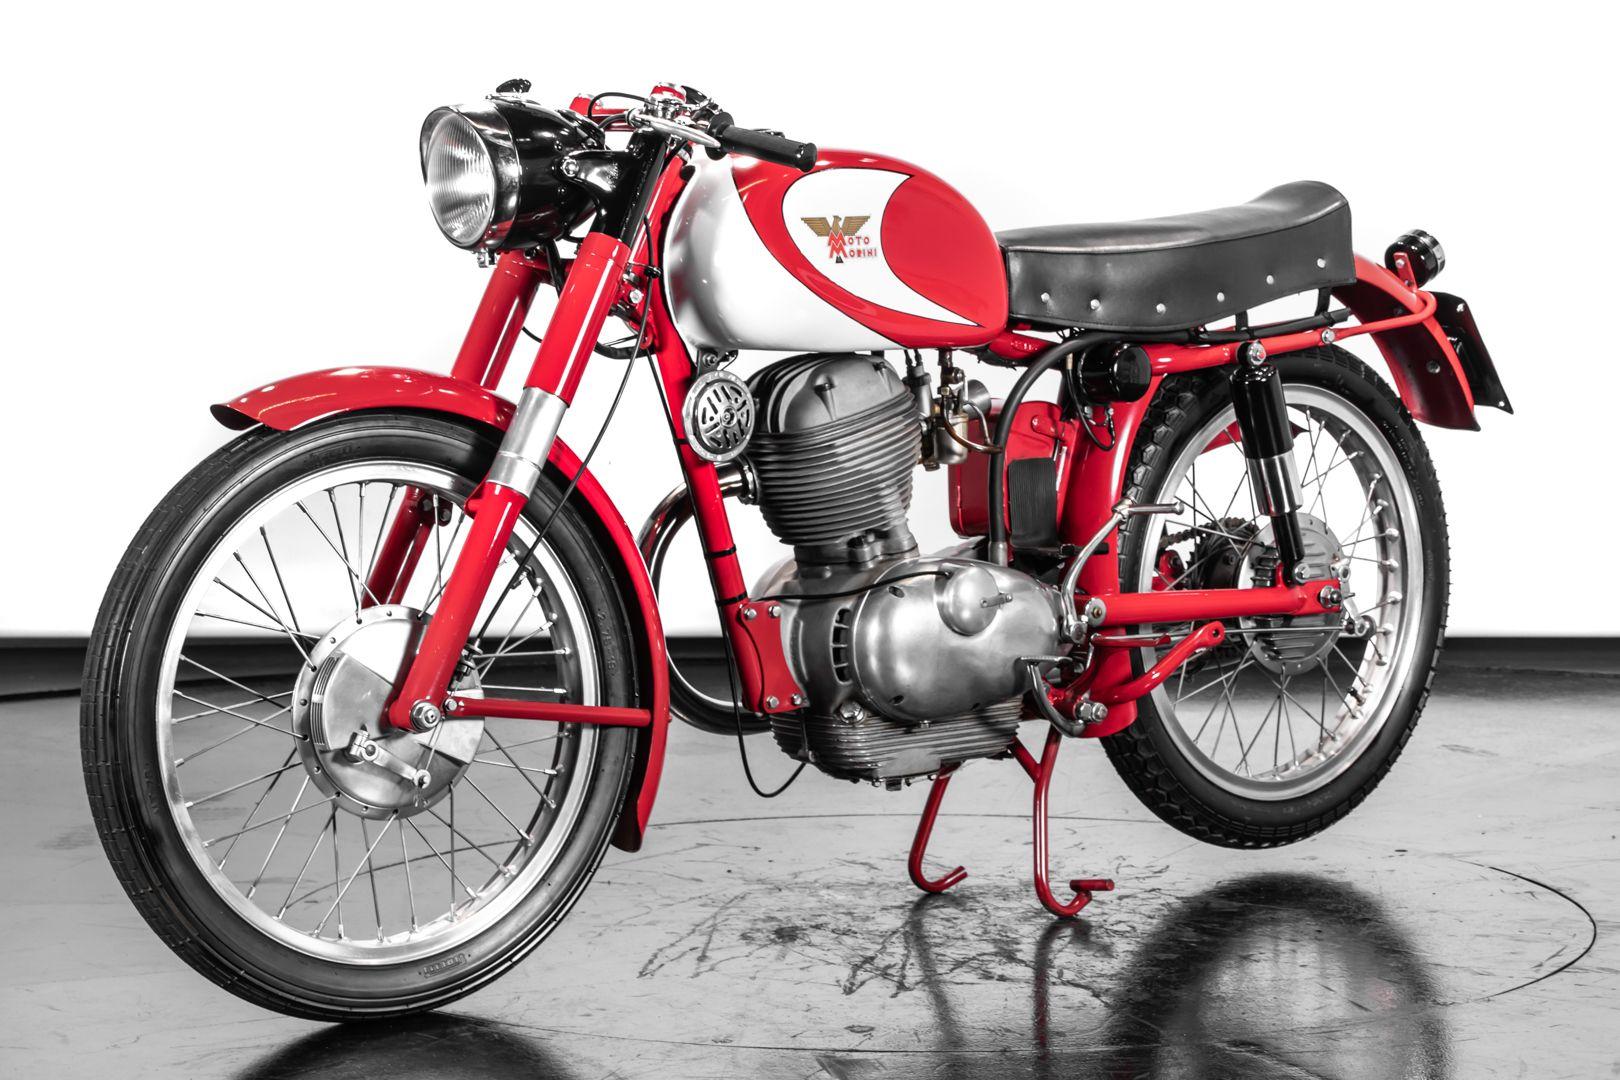 1958 Moto Morini S 175 78016